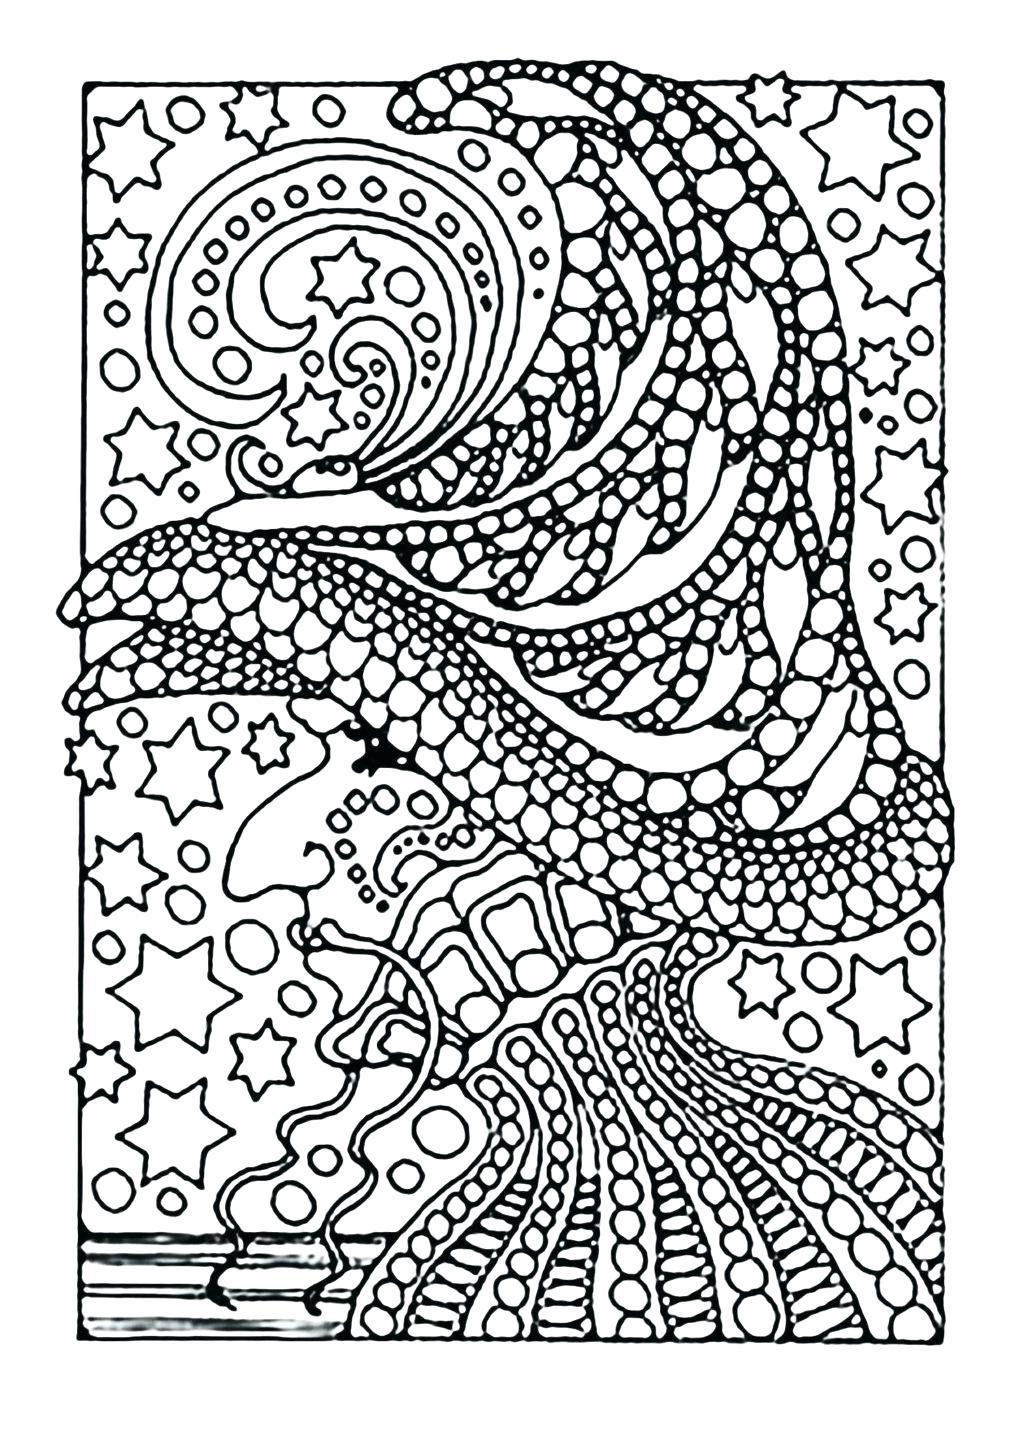 Reading Worksheets Will Make You Feel Better. | Asucartstudio regarding Free Printable Multiplication Hidden Pictures